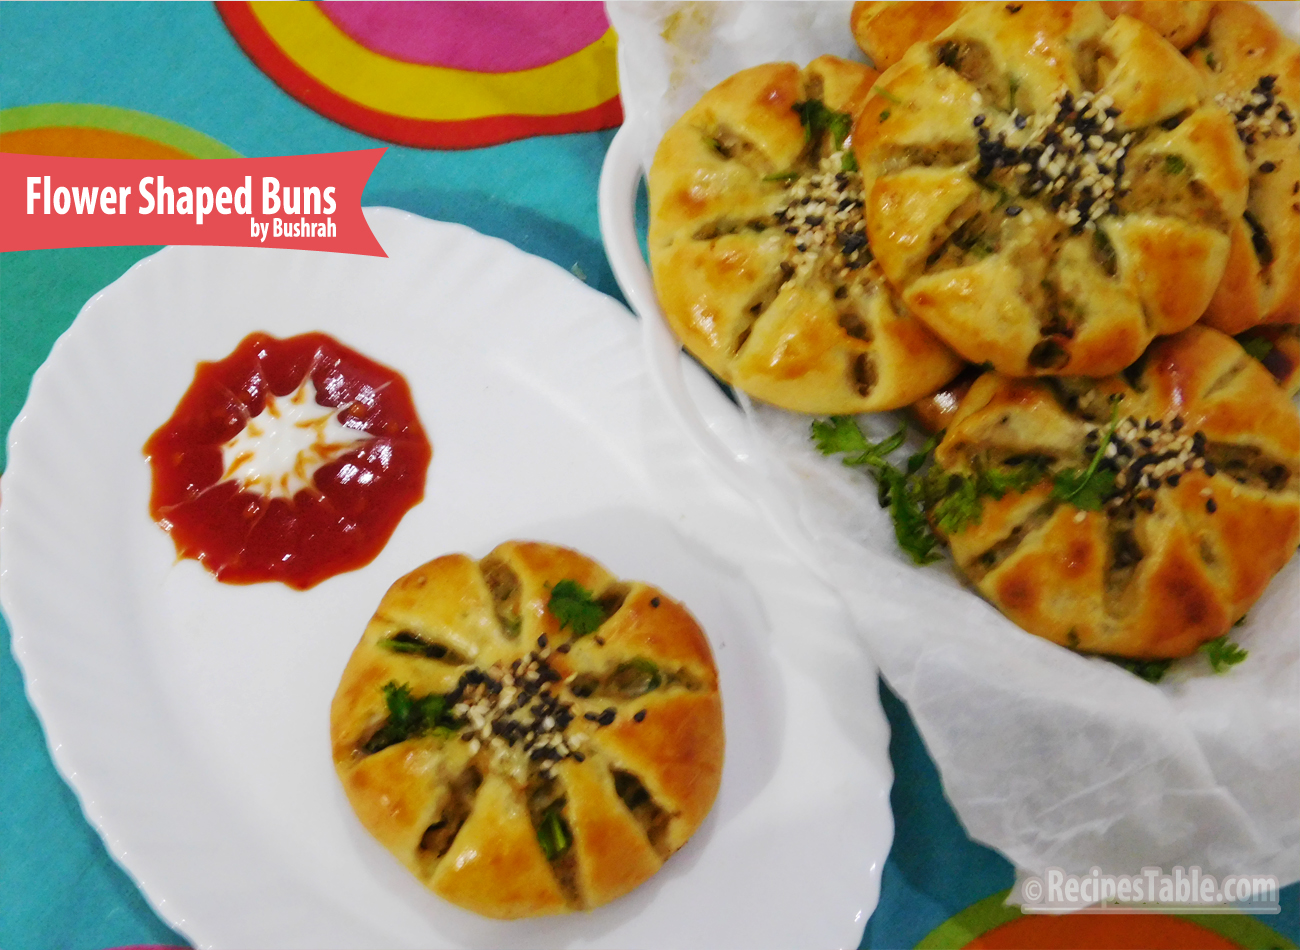 Flower Shaped Buns recipe